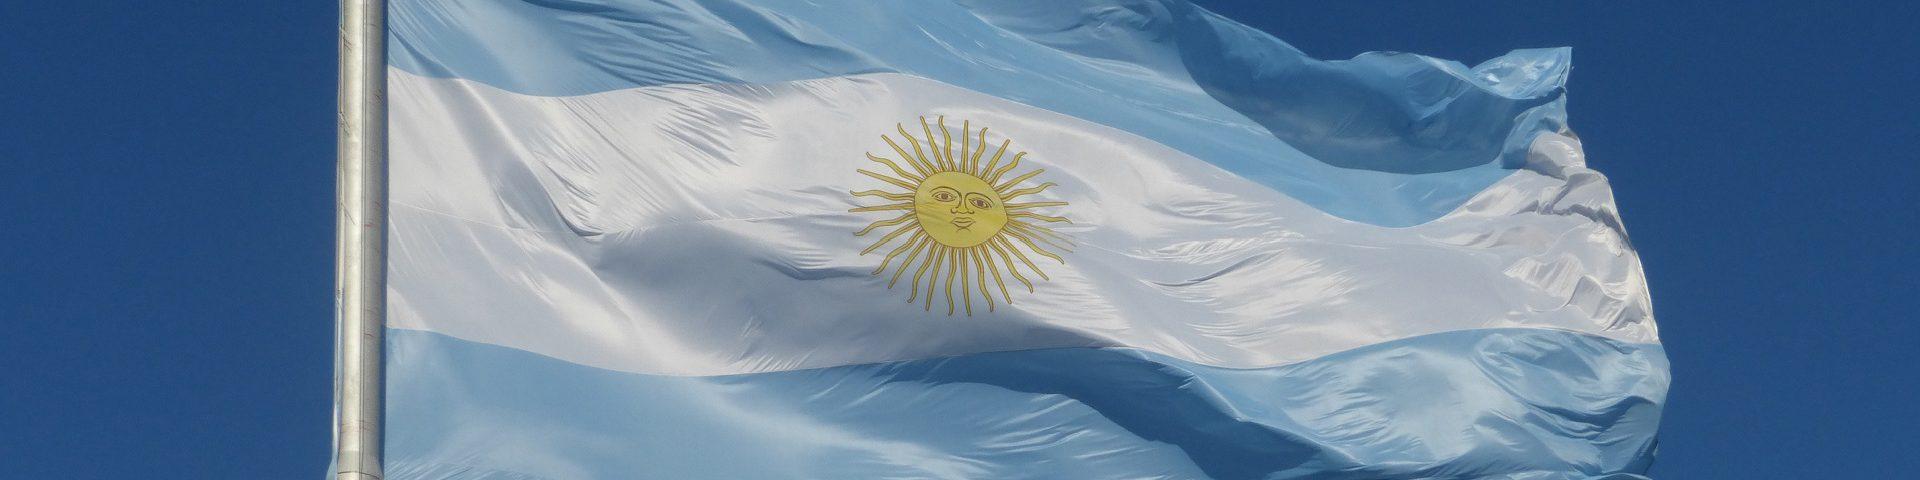 bandera-homenaje